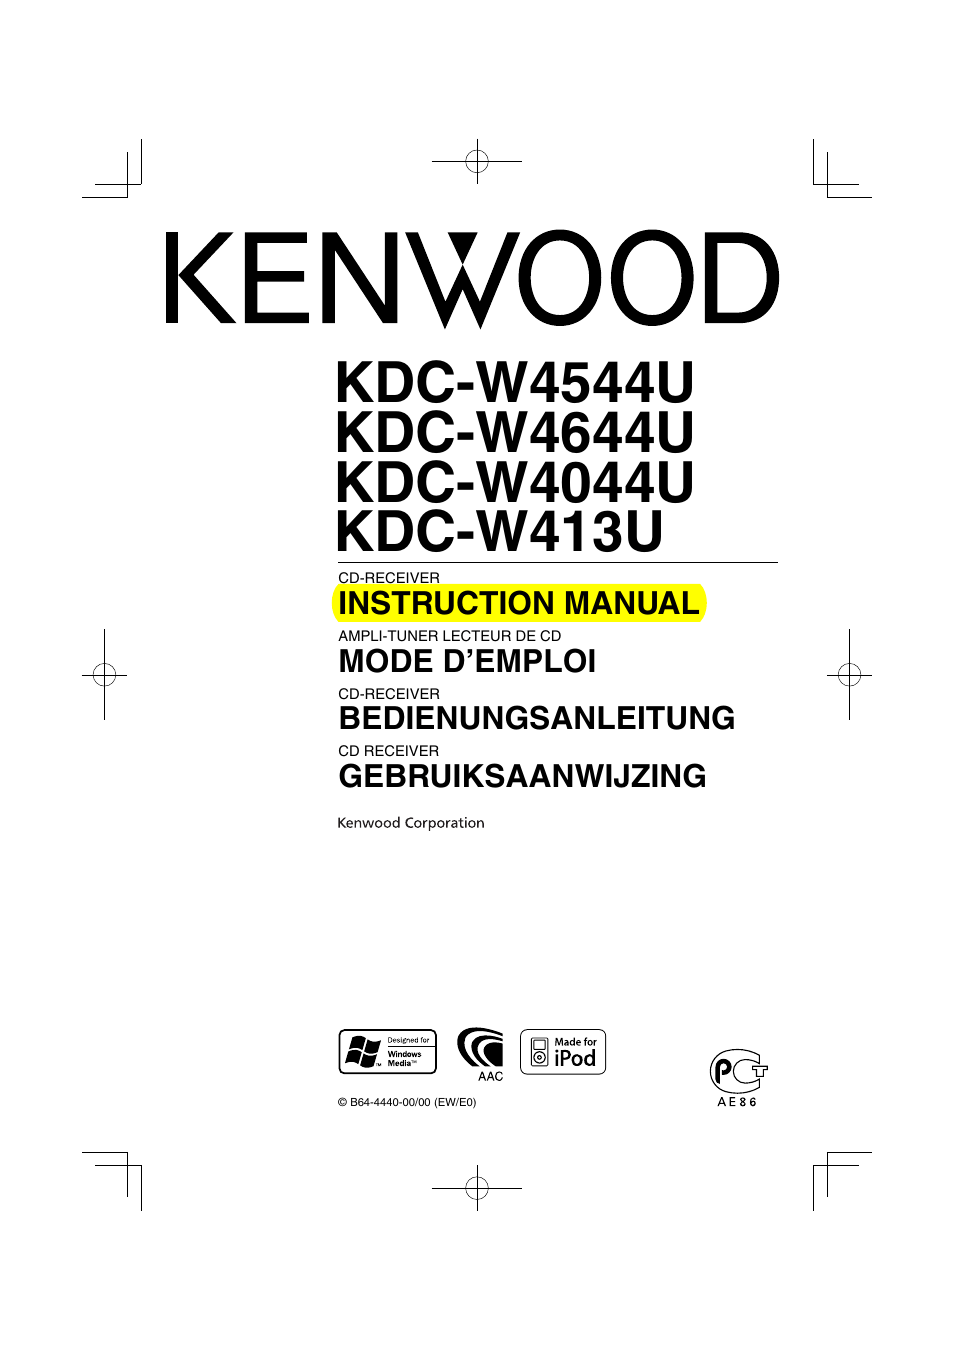 Bedienungsanleitung Kenwood Kdc W4544u